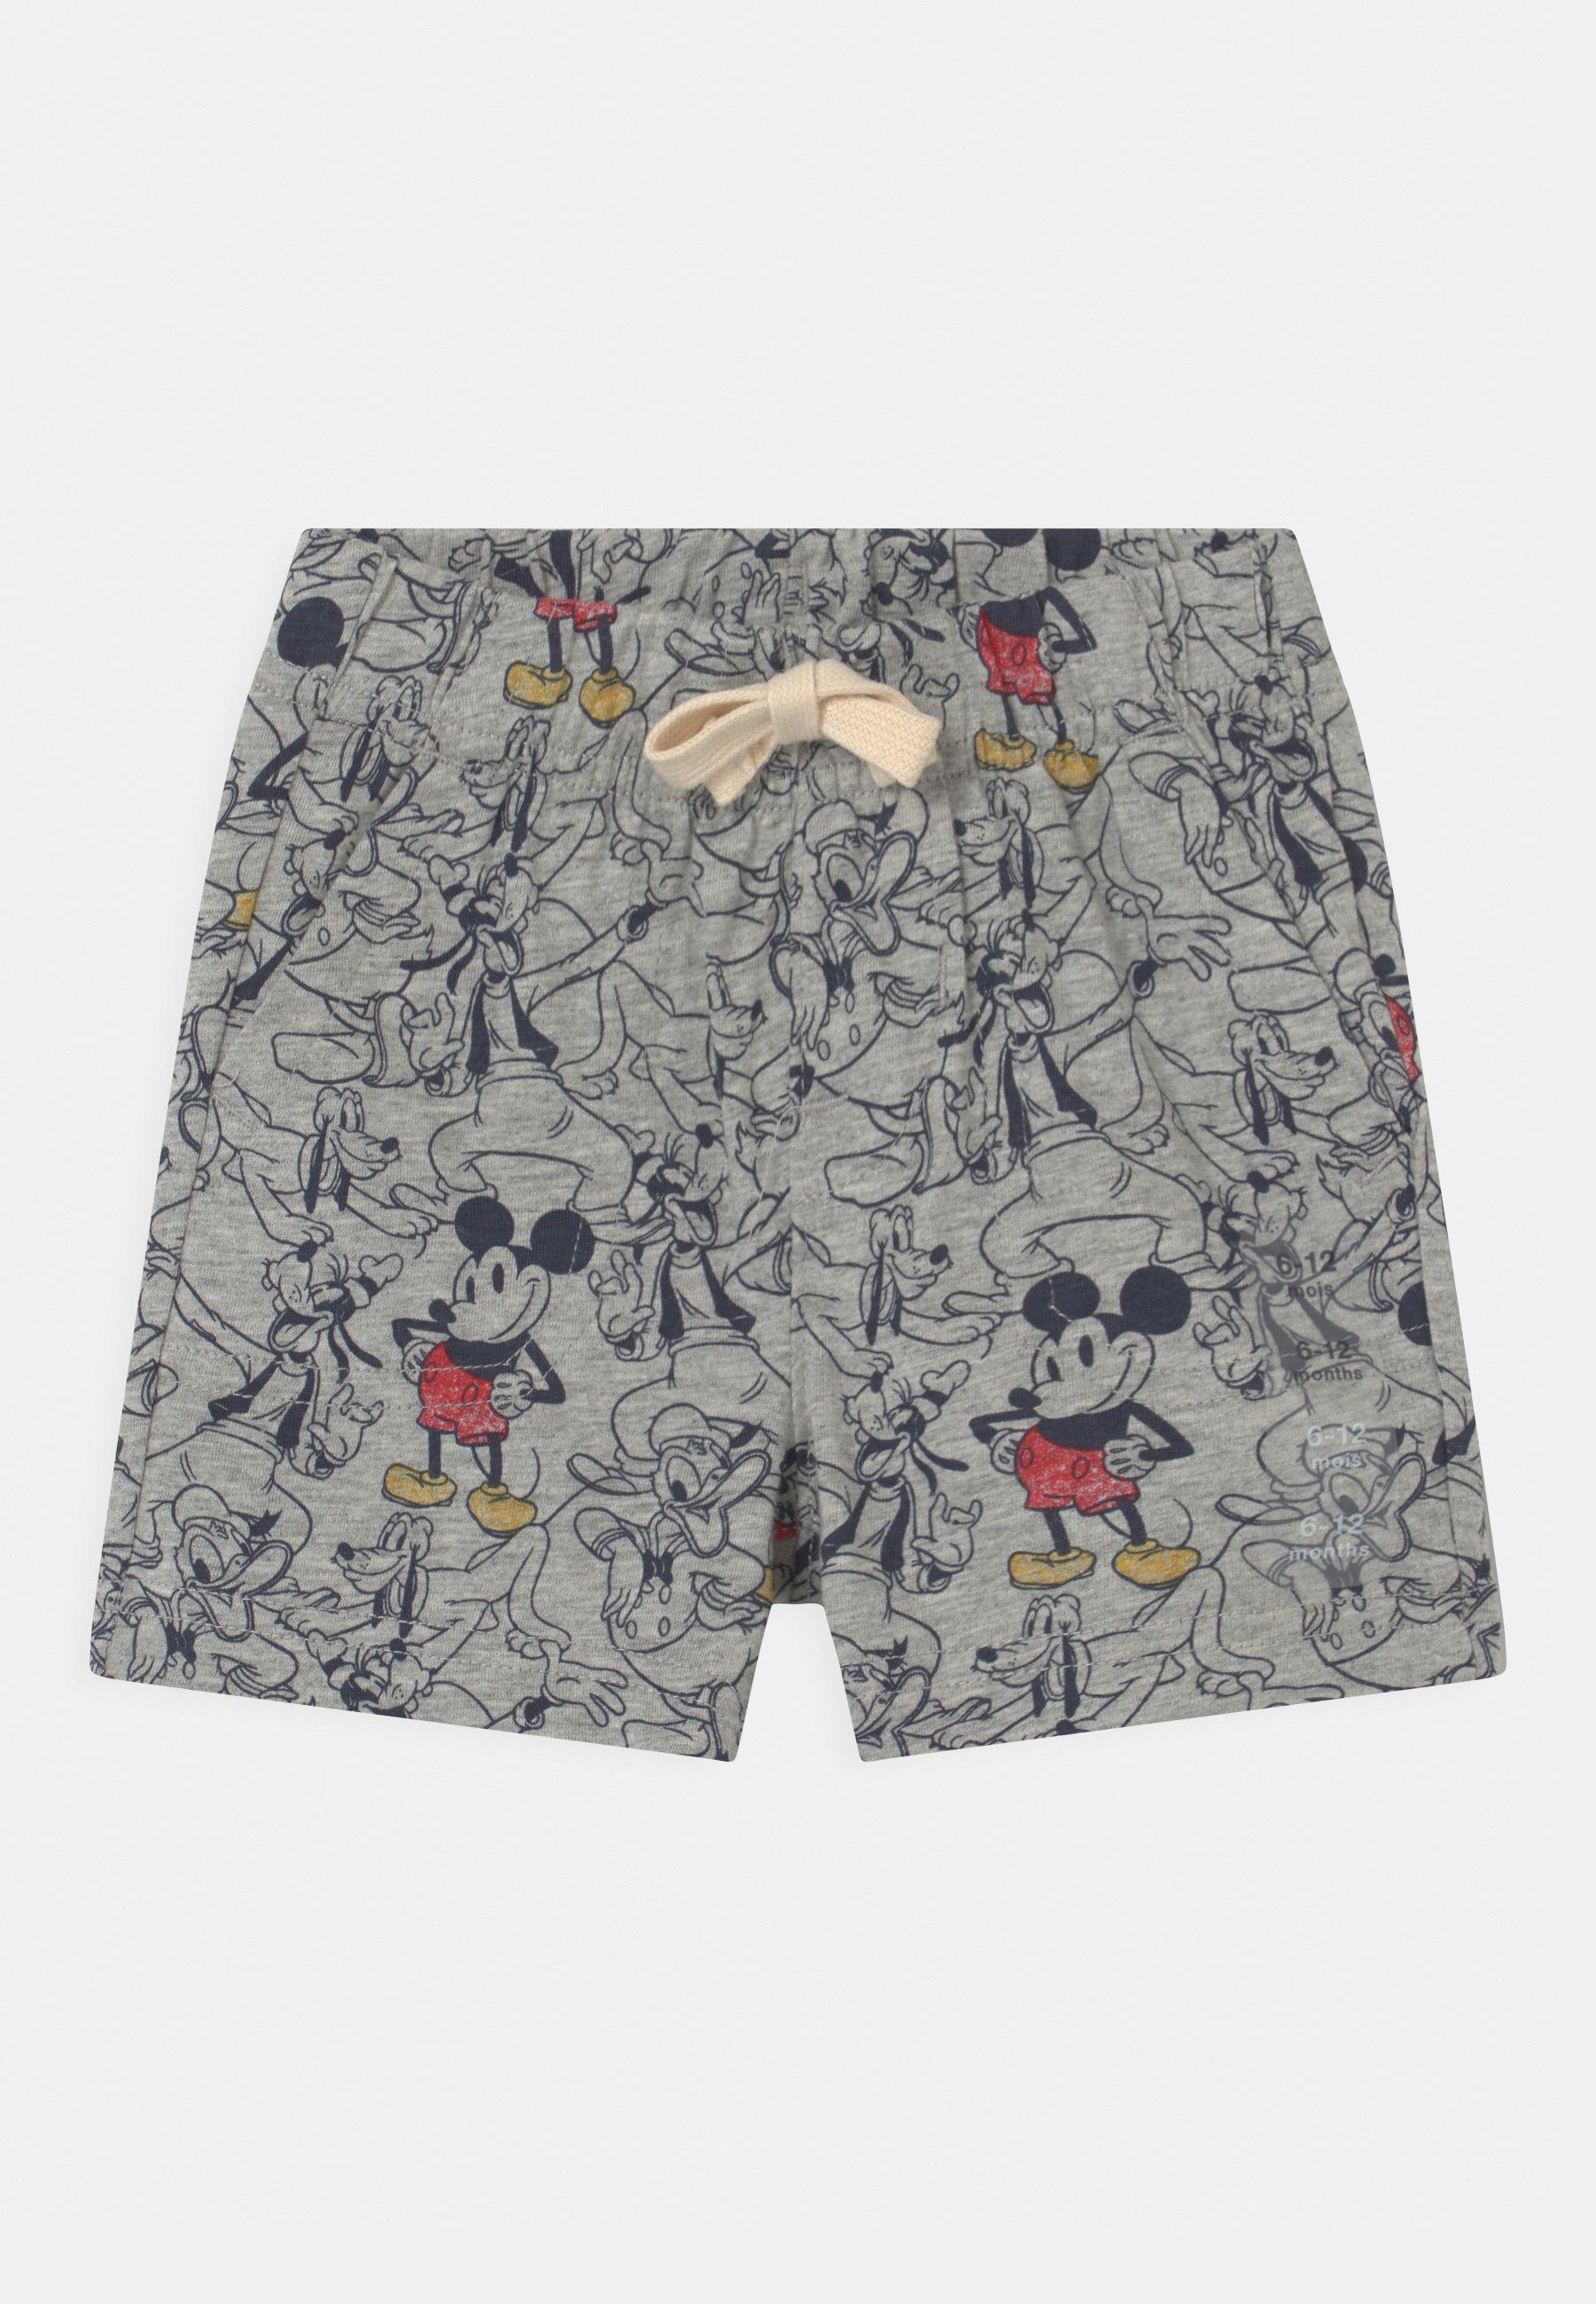 Bambini MICKEY MOUSE DISNEY - Shorts - light heather grey